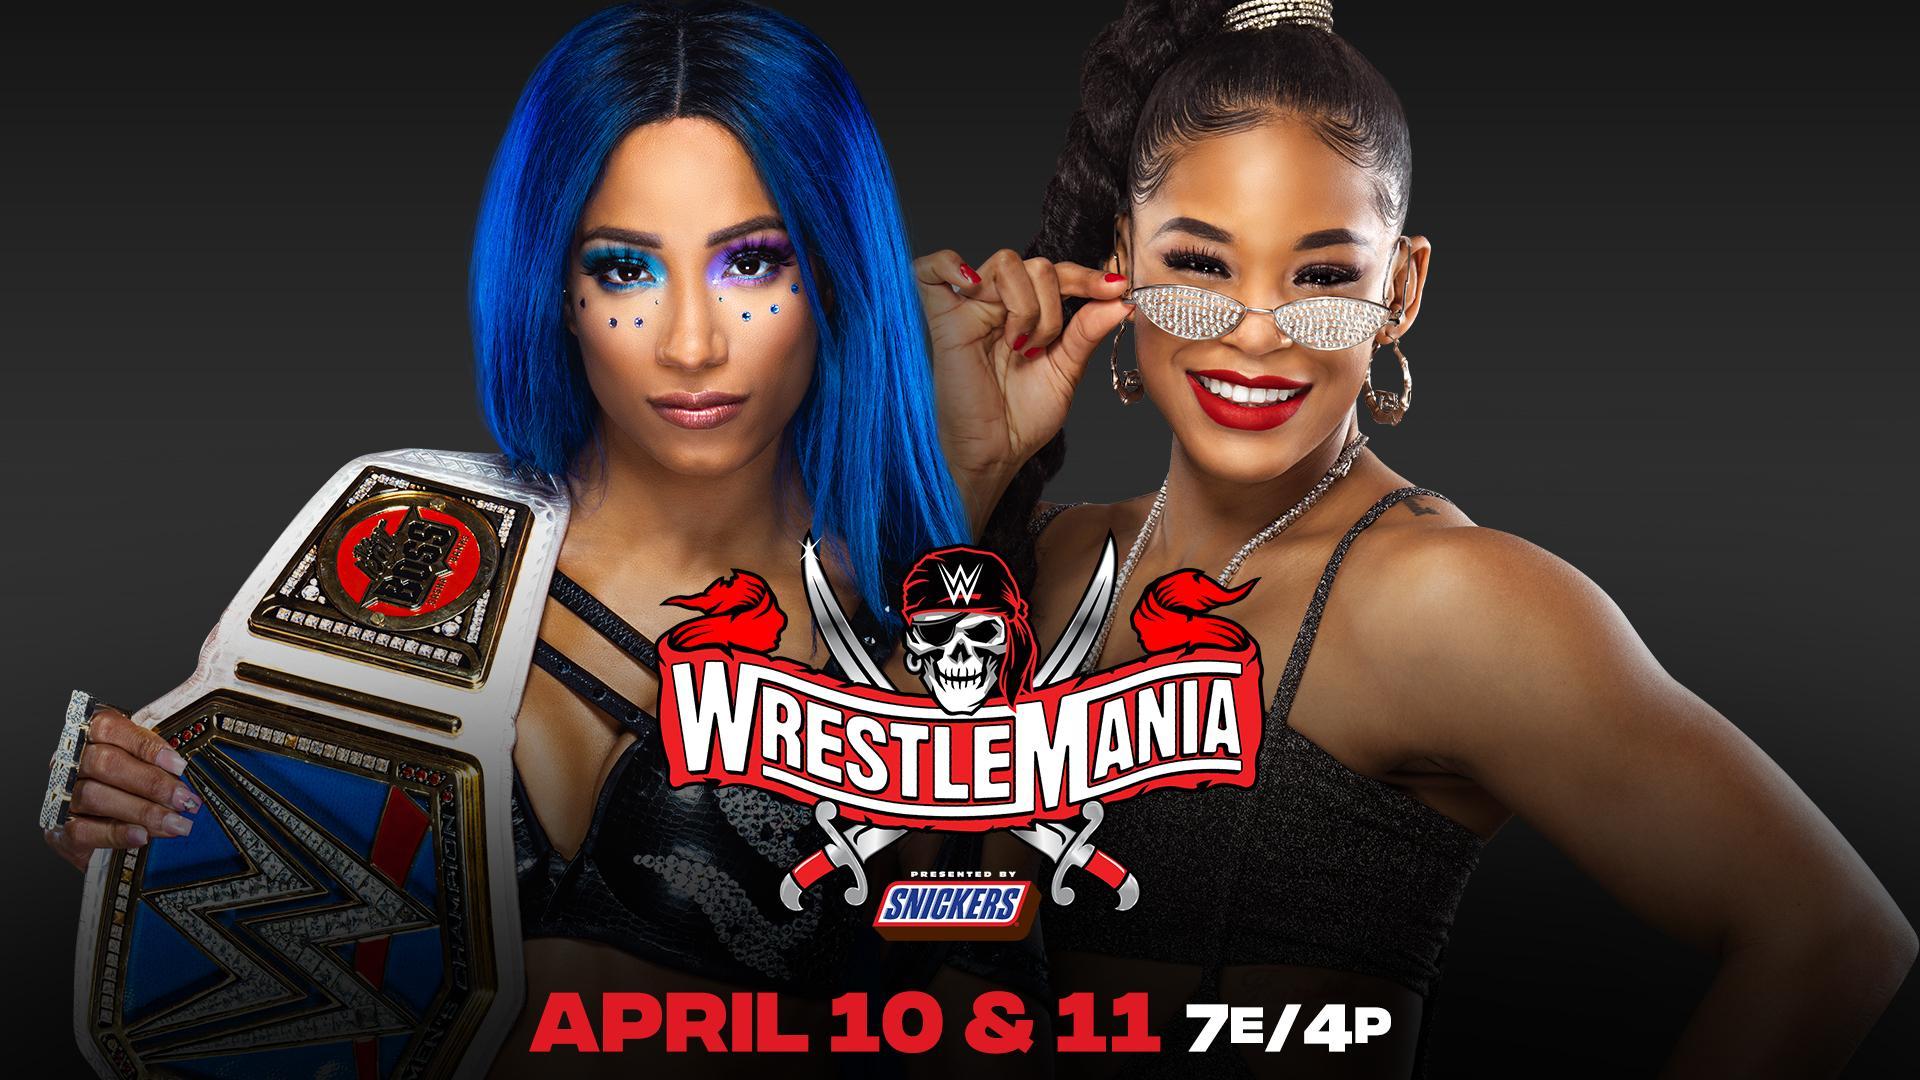 Sasha Banks vs. Bianca Belair Official for WrestleMania – TPWW